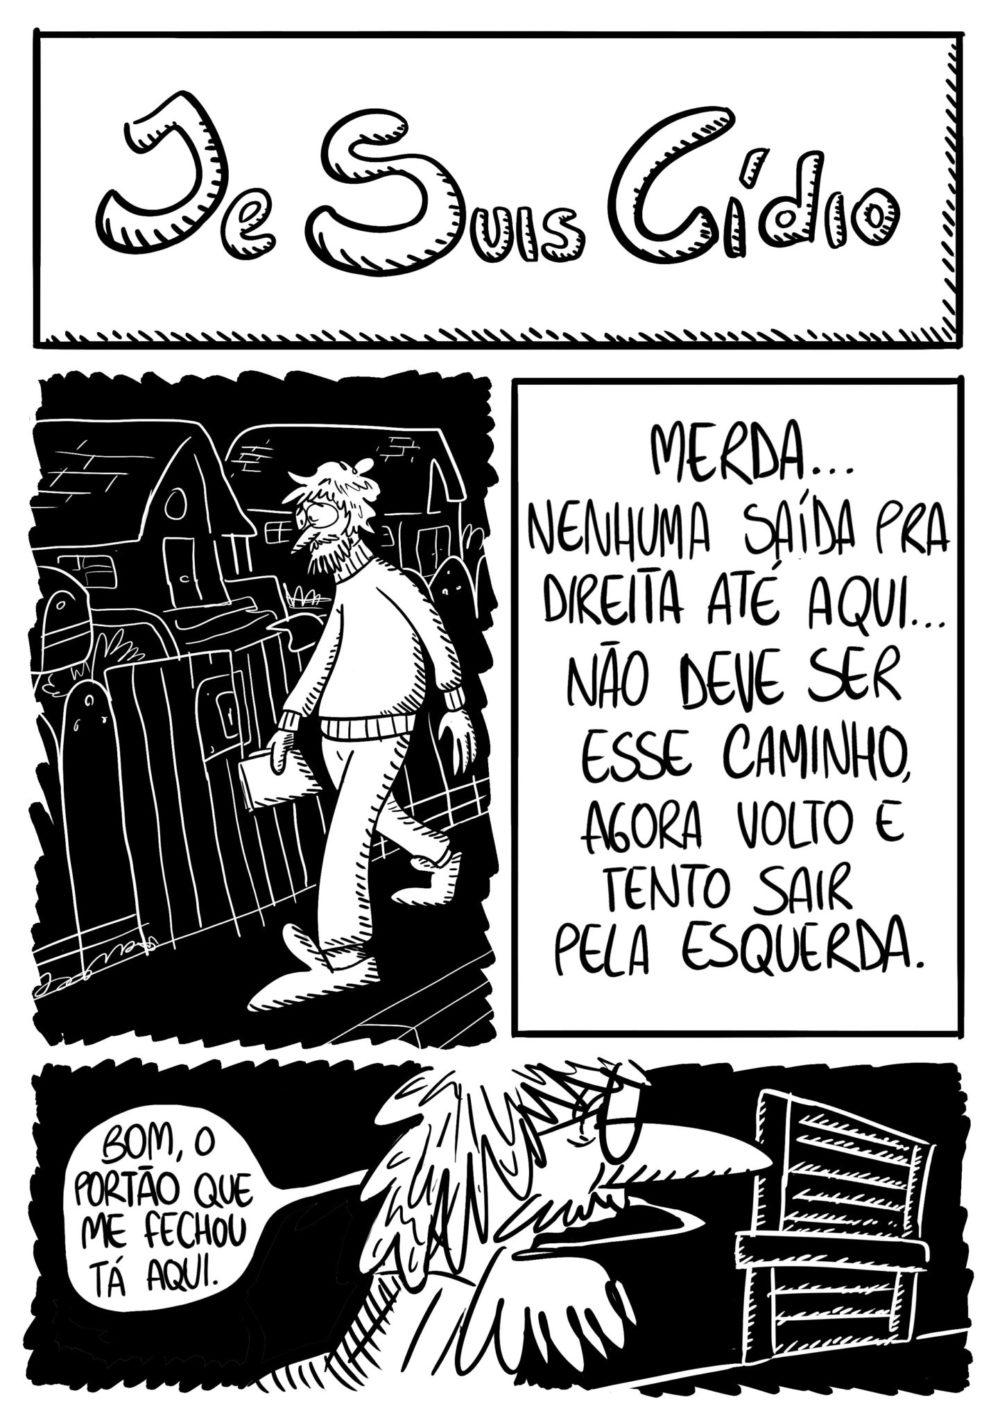 Je Suis Cídio #8, por João B. Godoi